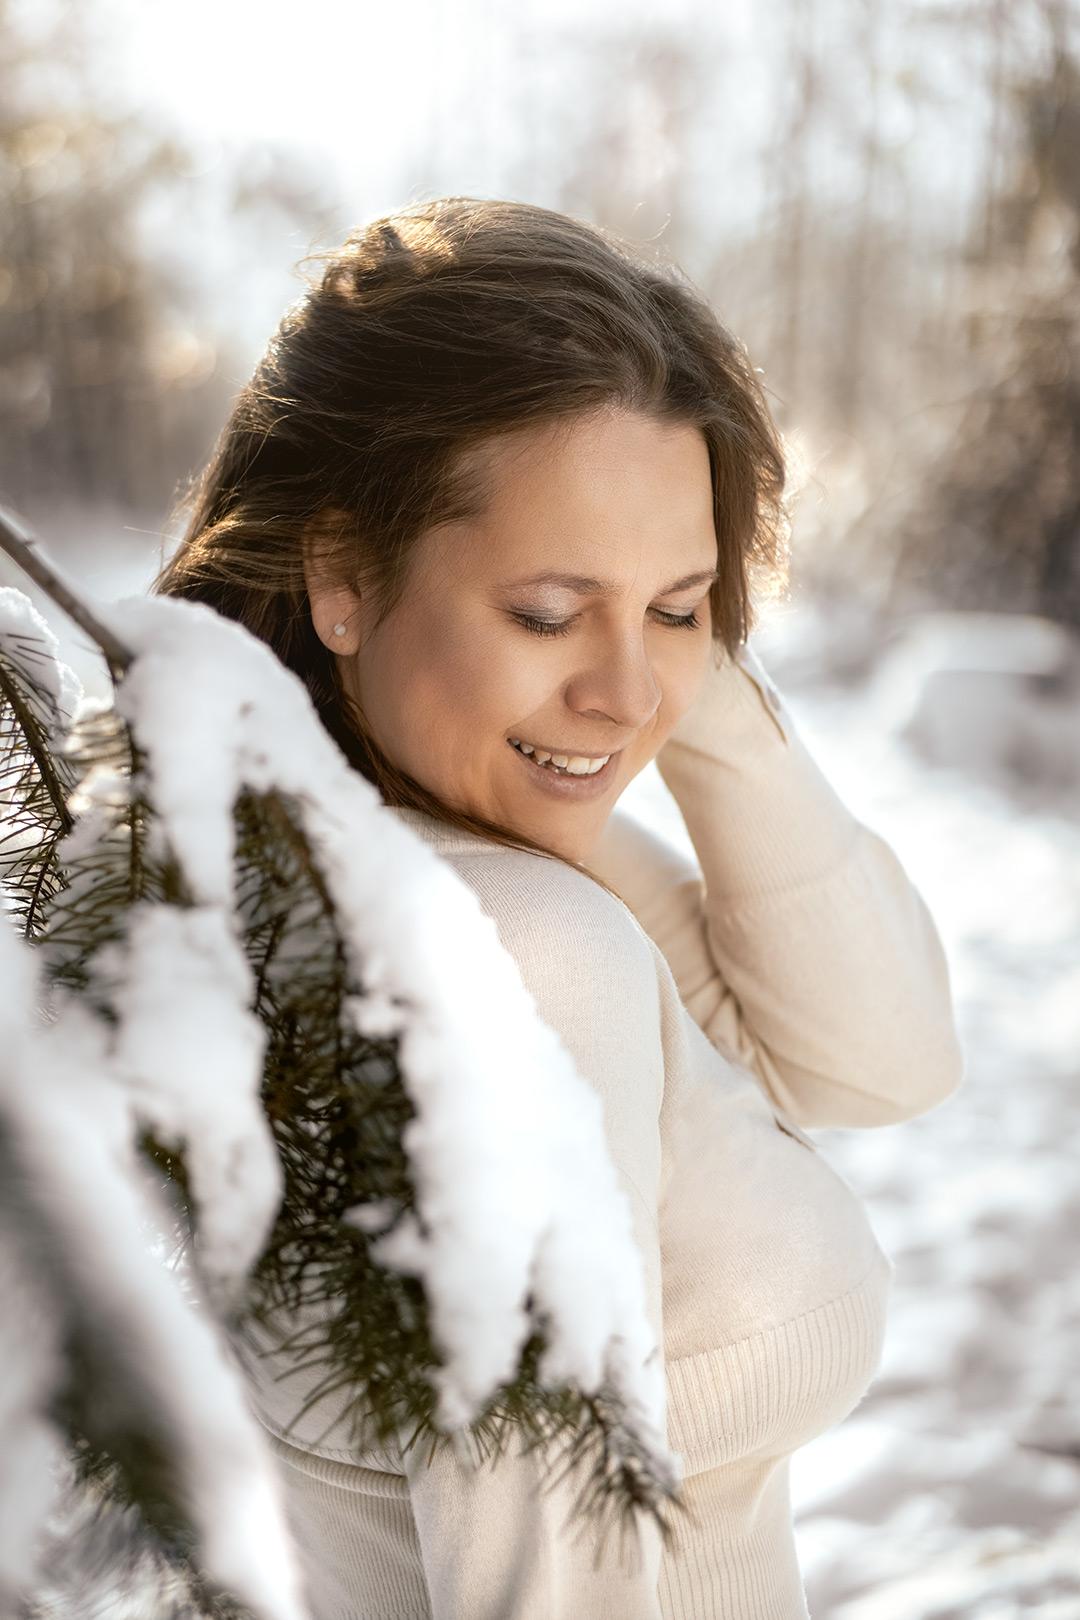 winter fotoshooting Frau in Weißen Kleid im Schnee